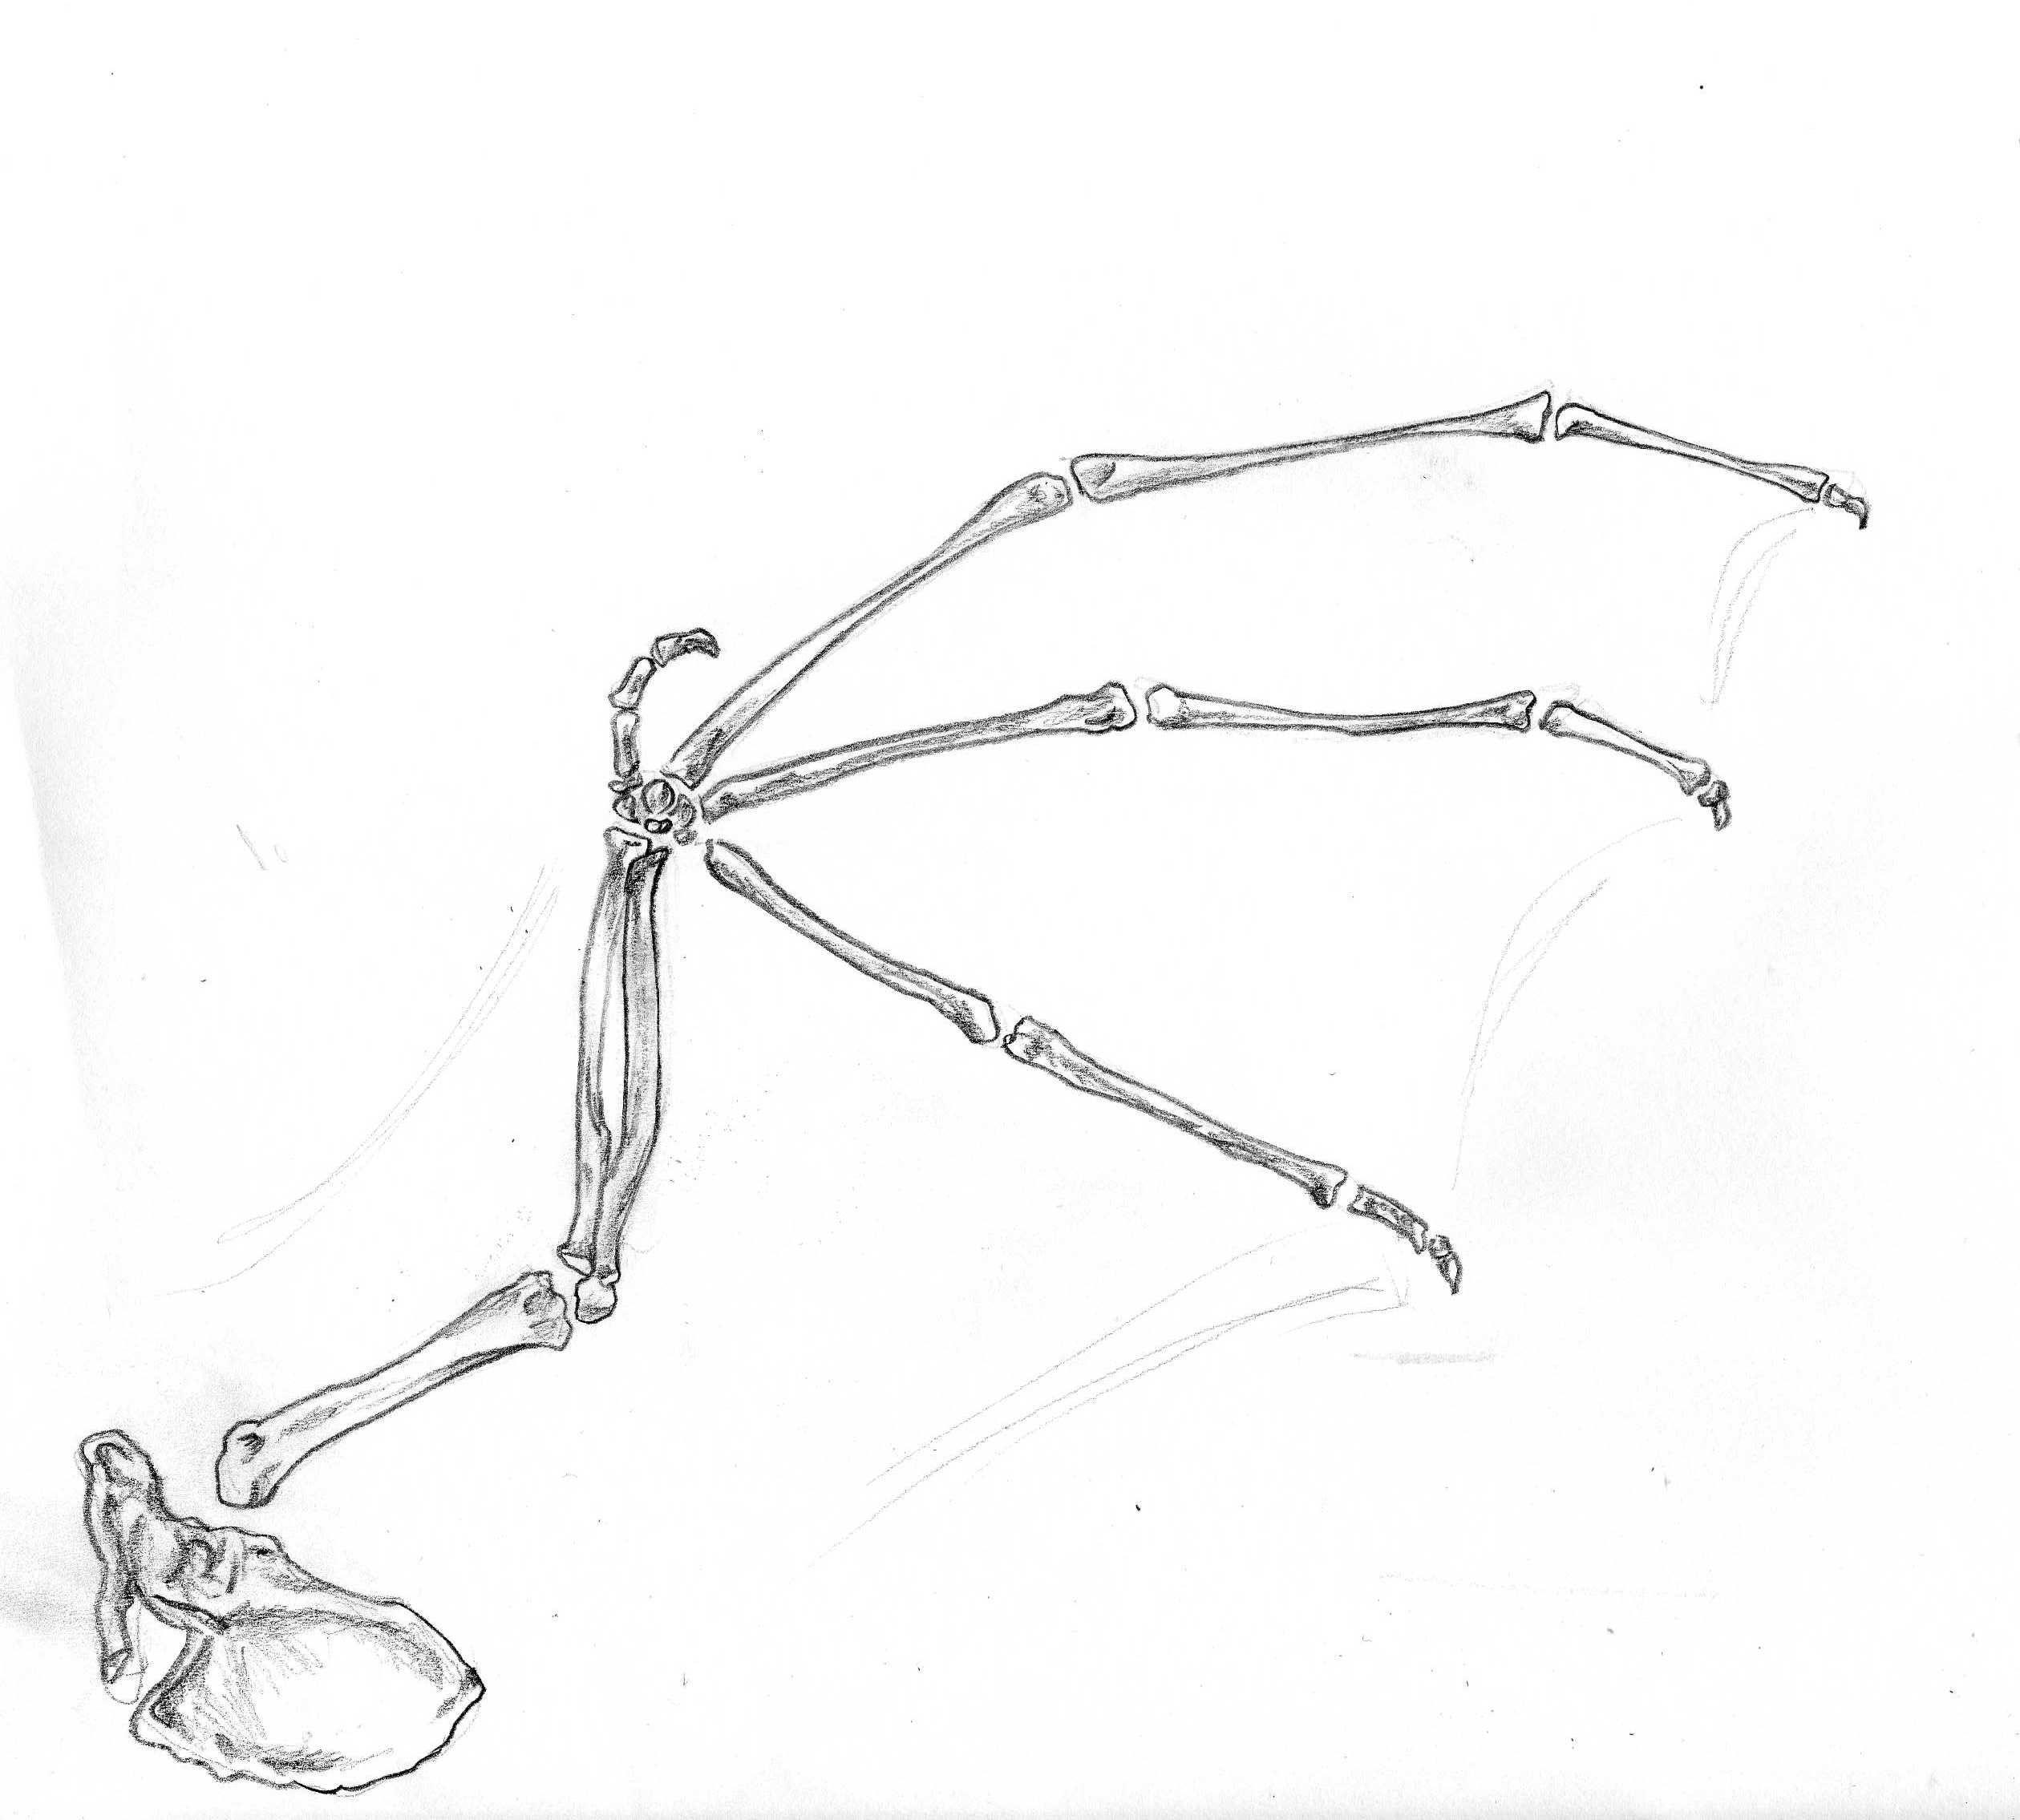 Bat wing bones | Wings | Pinterest | Bat wings and Mythology